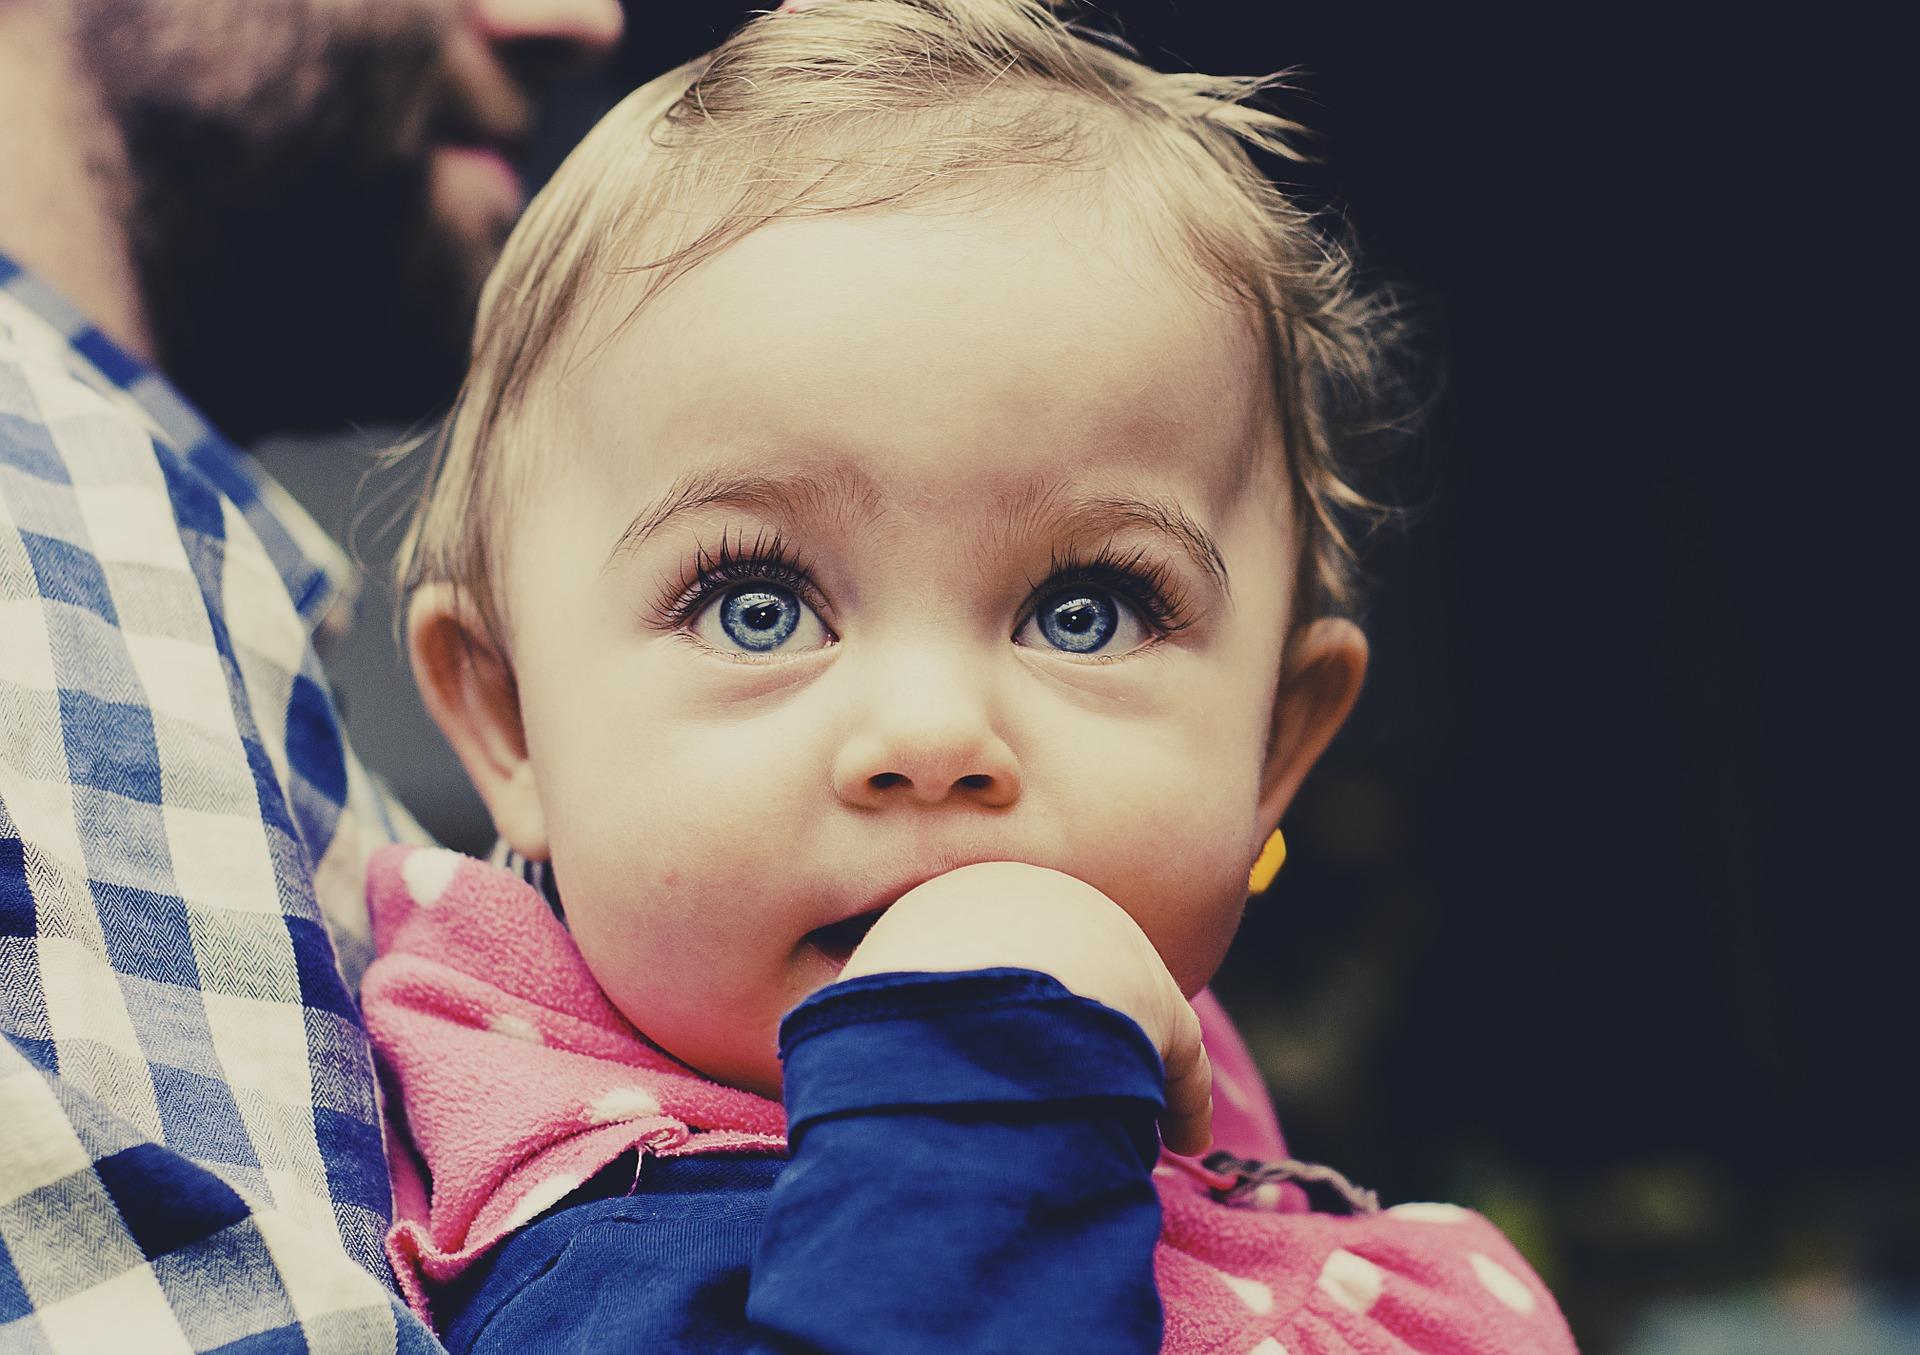 baby-933097_1920.jpg